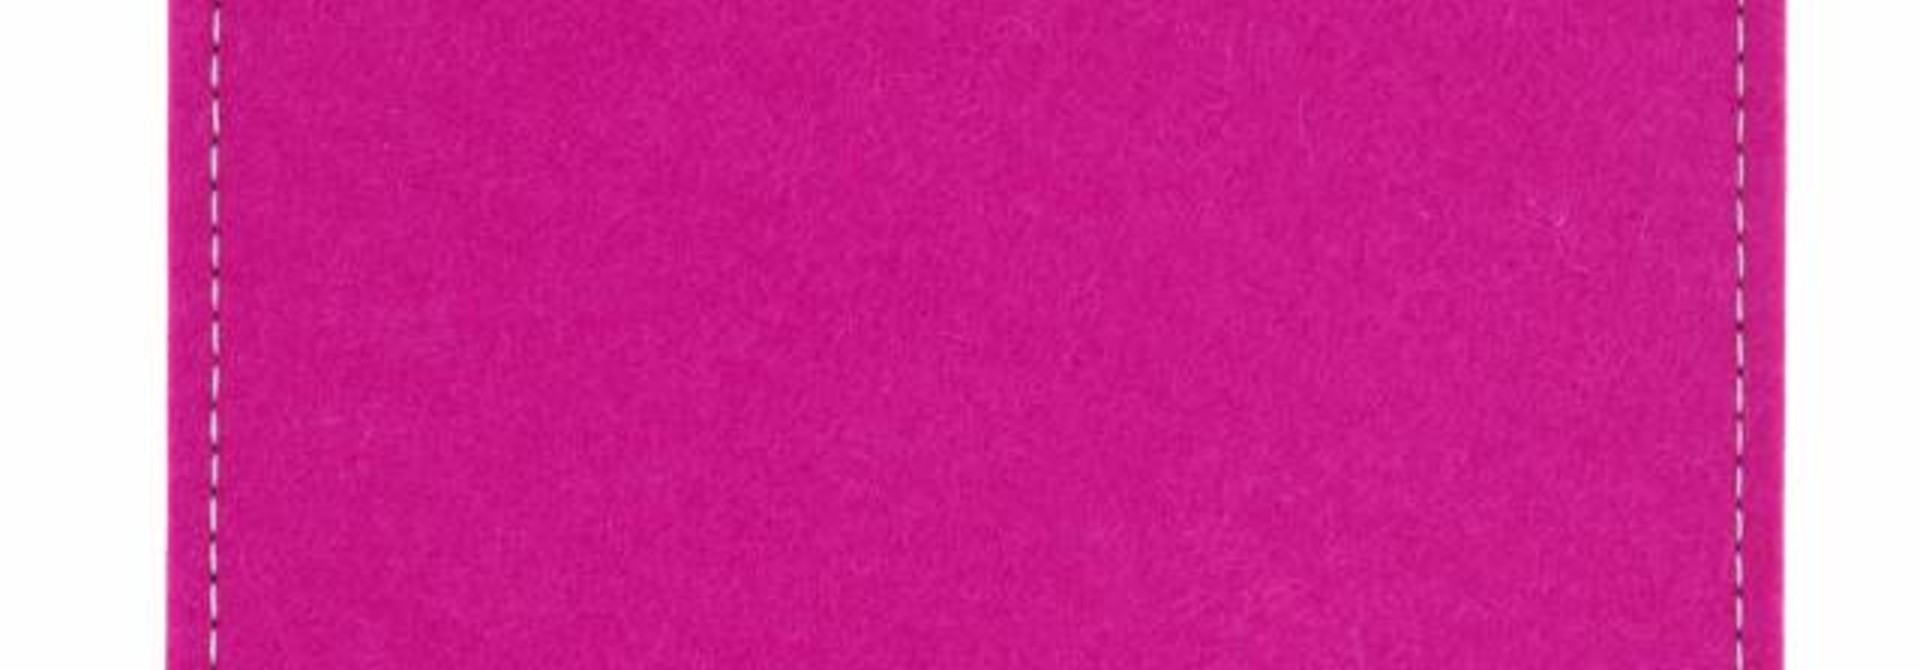 Chromebook Sleeve Pink